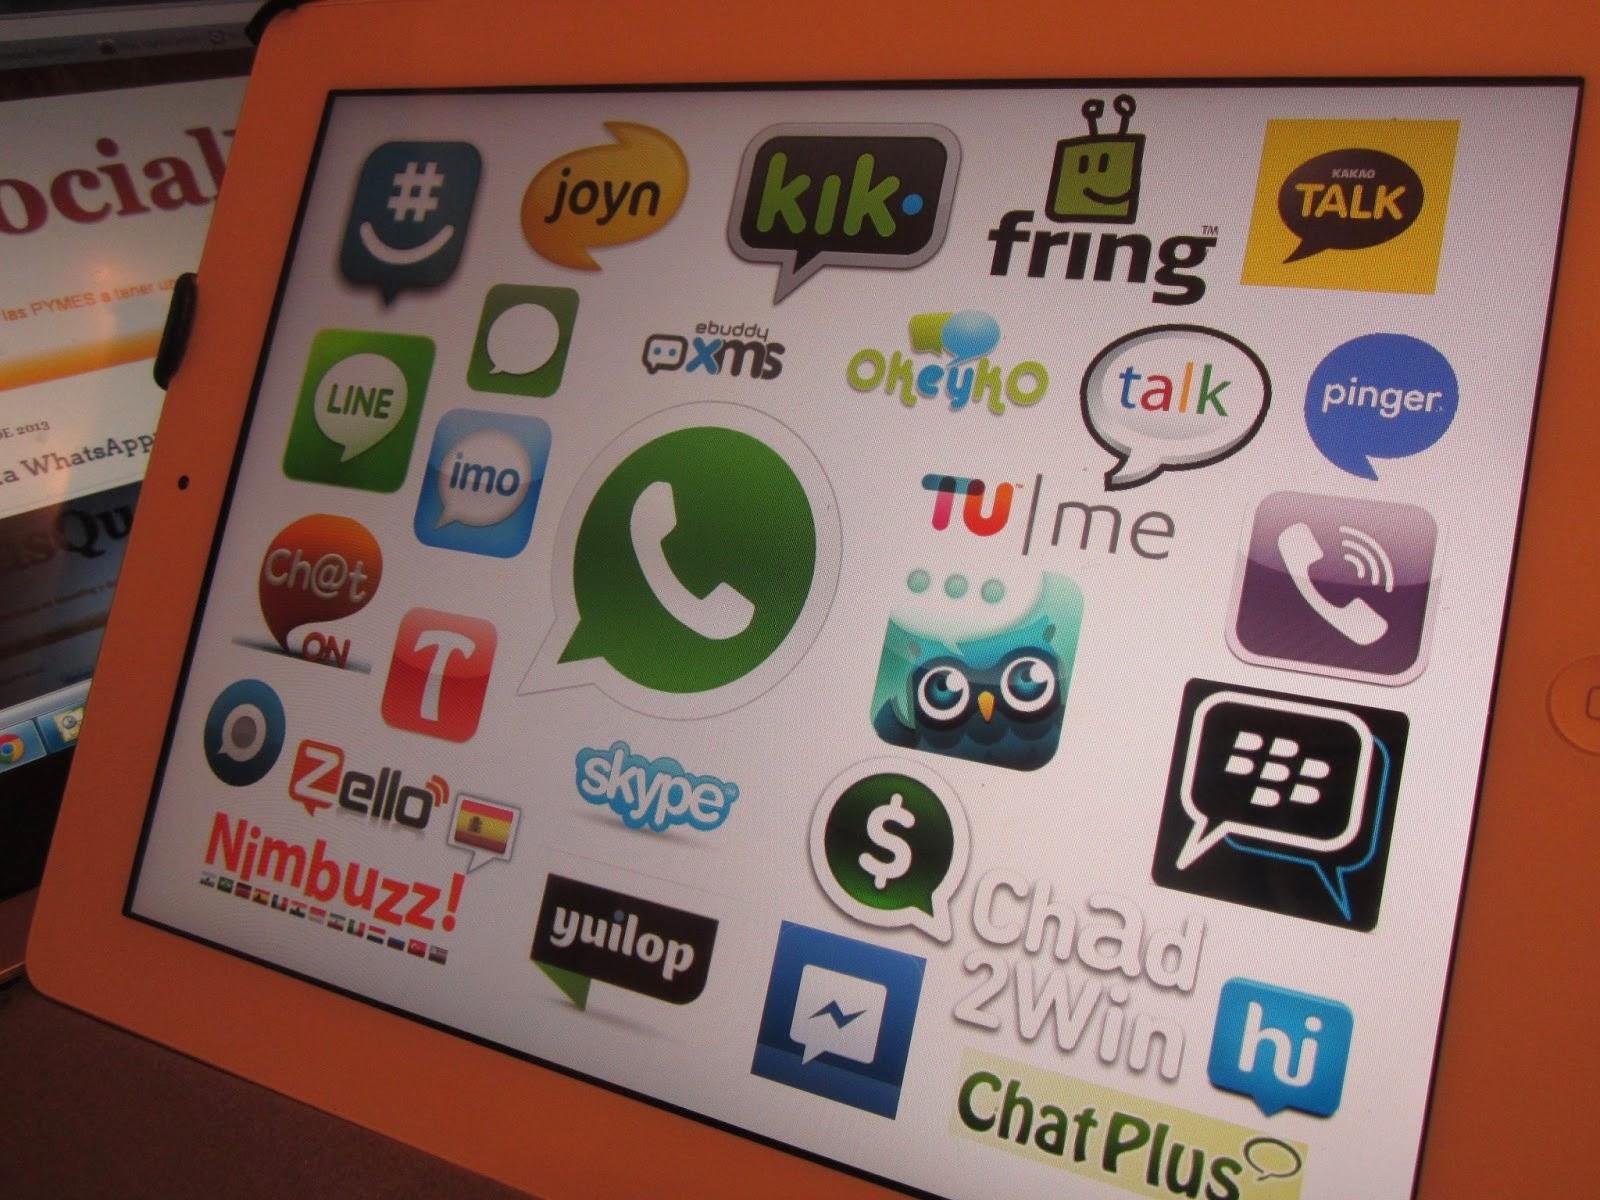 Alternativas a WhatsApp. Descargar. Bajar. smartphones, móvil, aplicaciones, HOOKT MESSENGER, VIBER, BLACKBERRY MESSENGER, LINE, TELEGRAM, ChatOn, TalkDroid Messenger